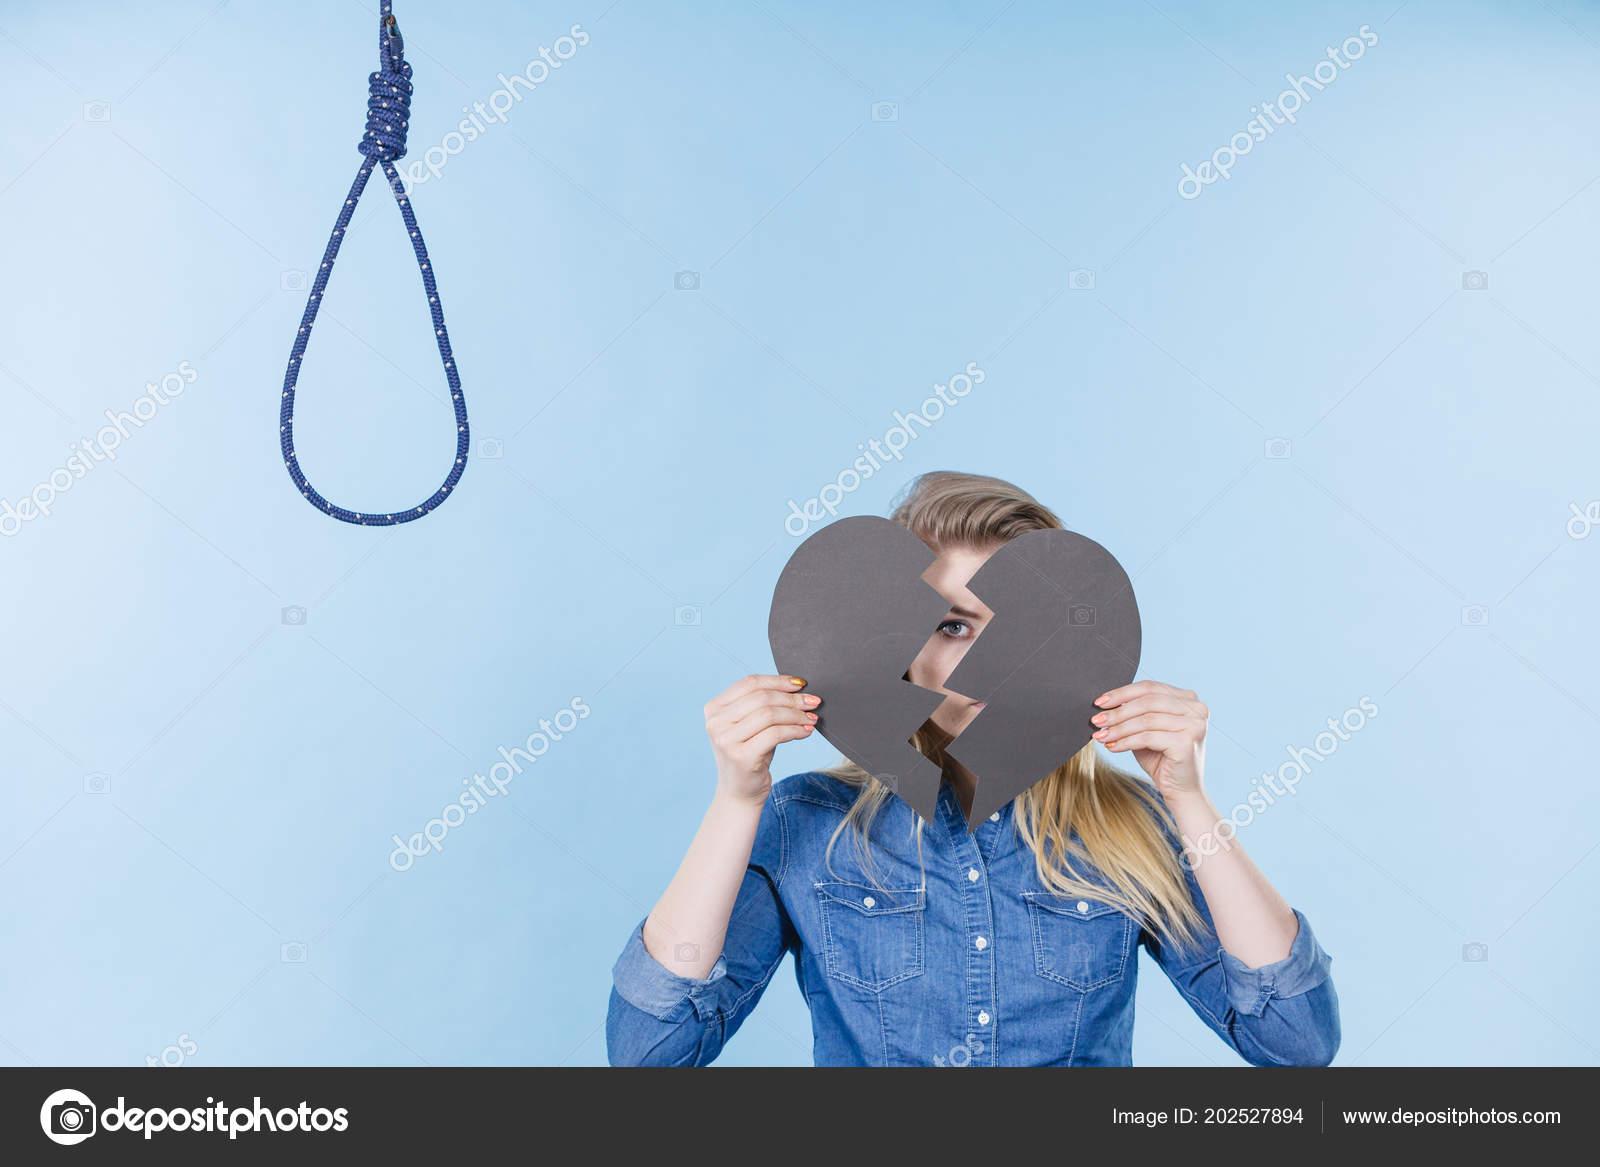 Sad Depressed Woman Thinking Suicide Having Broken Heart Relationship Breakup Stock Photo C Anetlanda 202527894